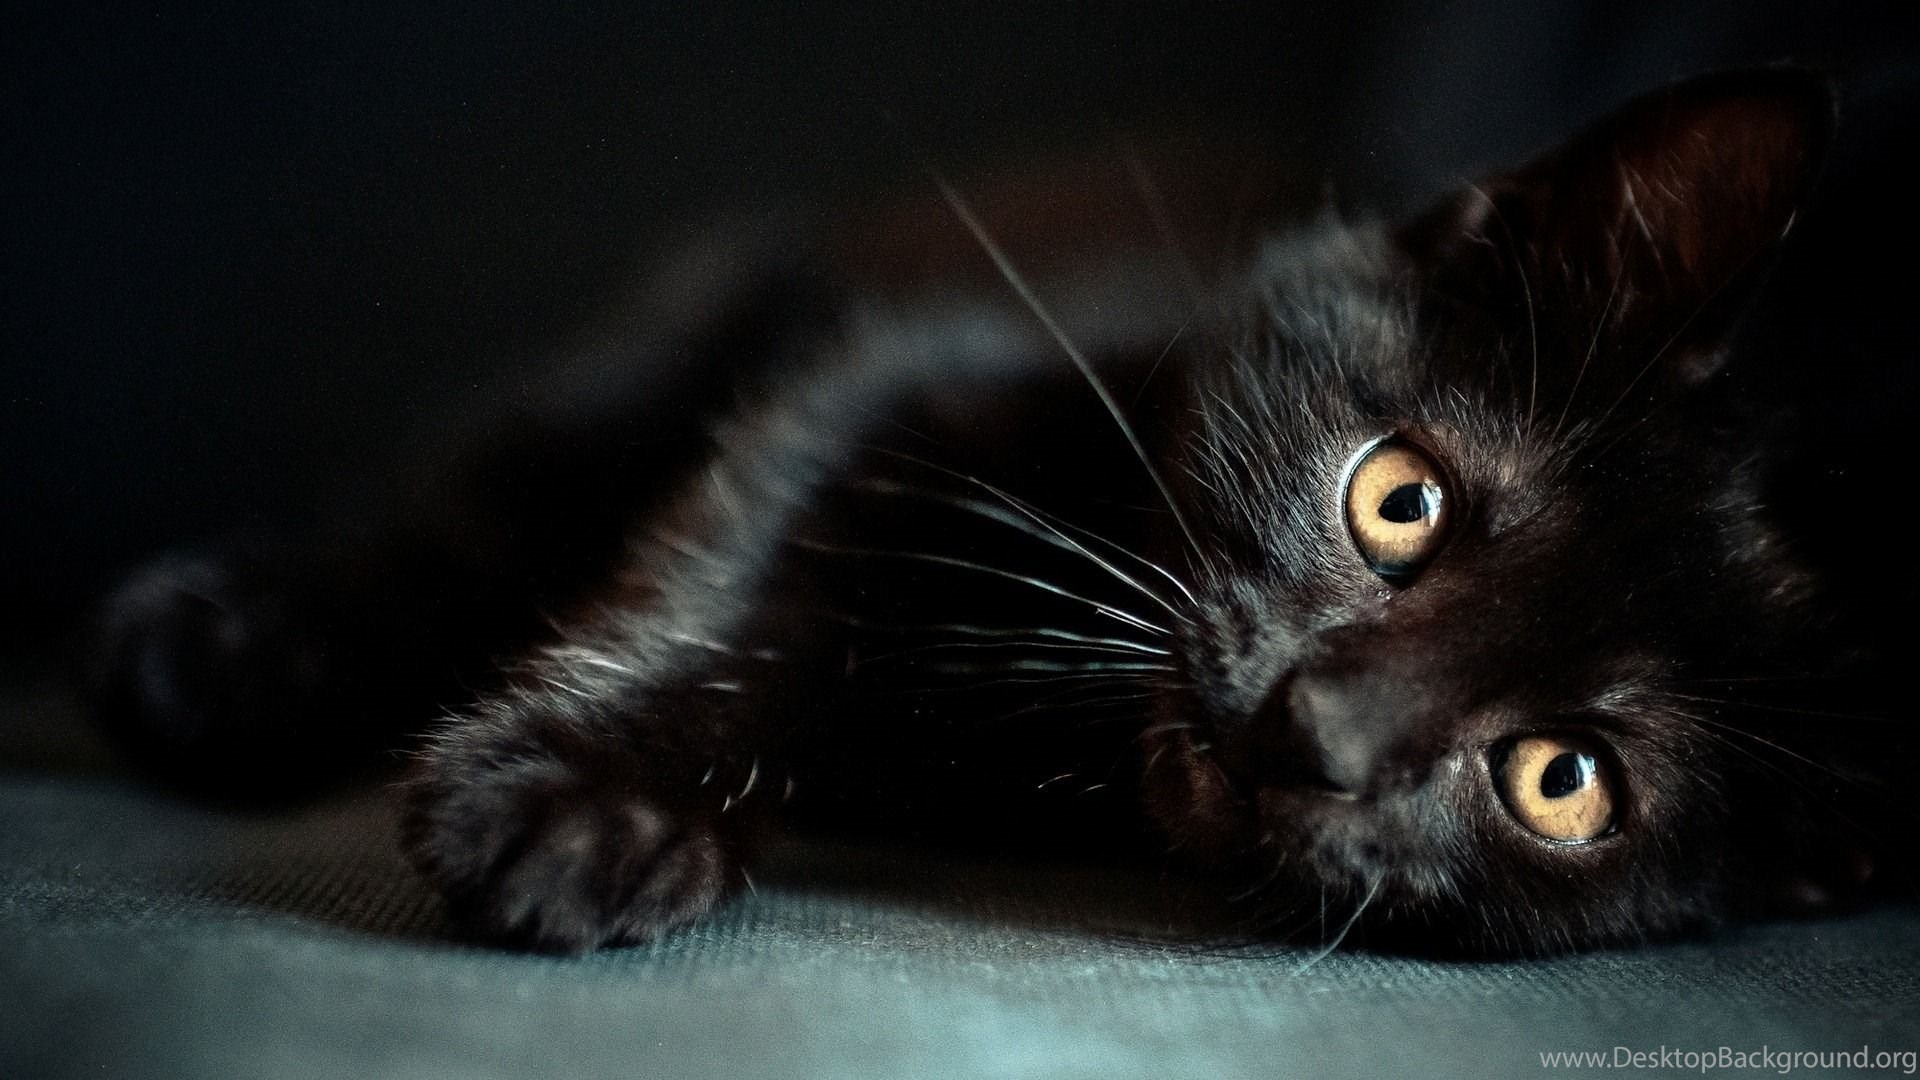 Halloween Black Cat Cute Wallpaper Desktop Background